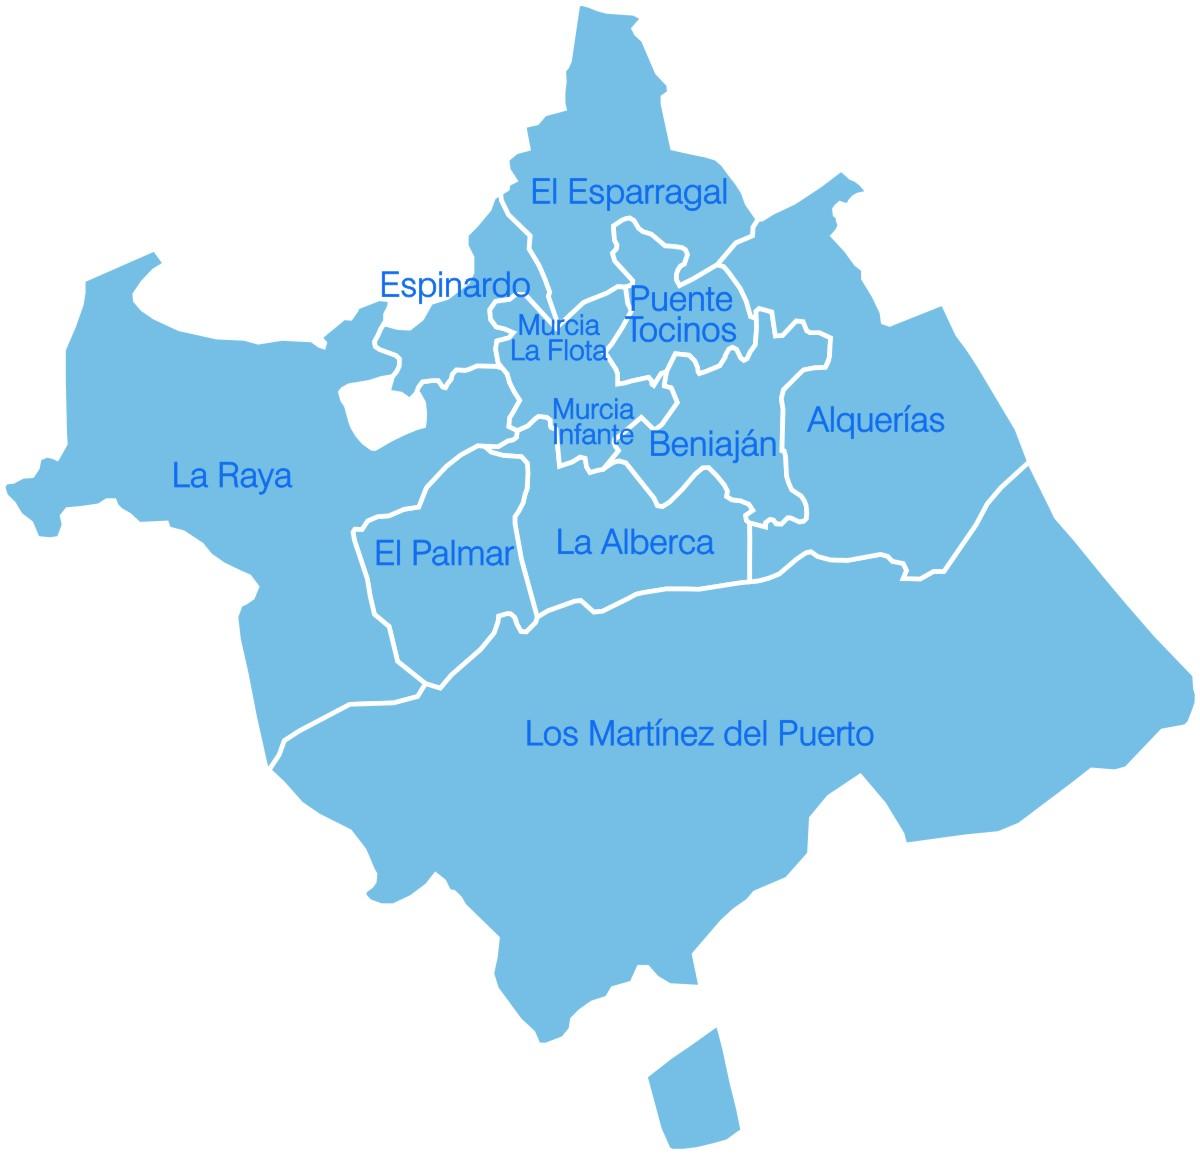 Mapa Murcia y Pedanias